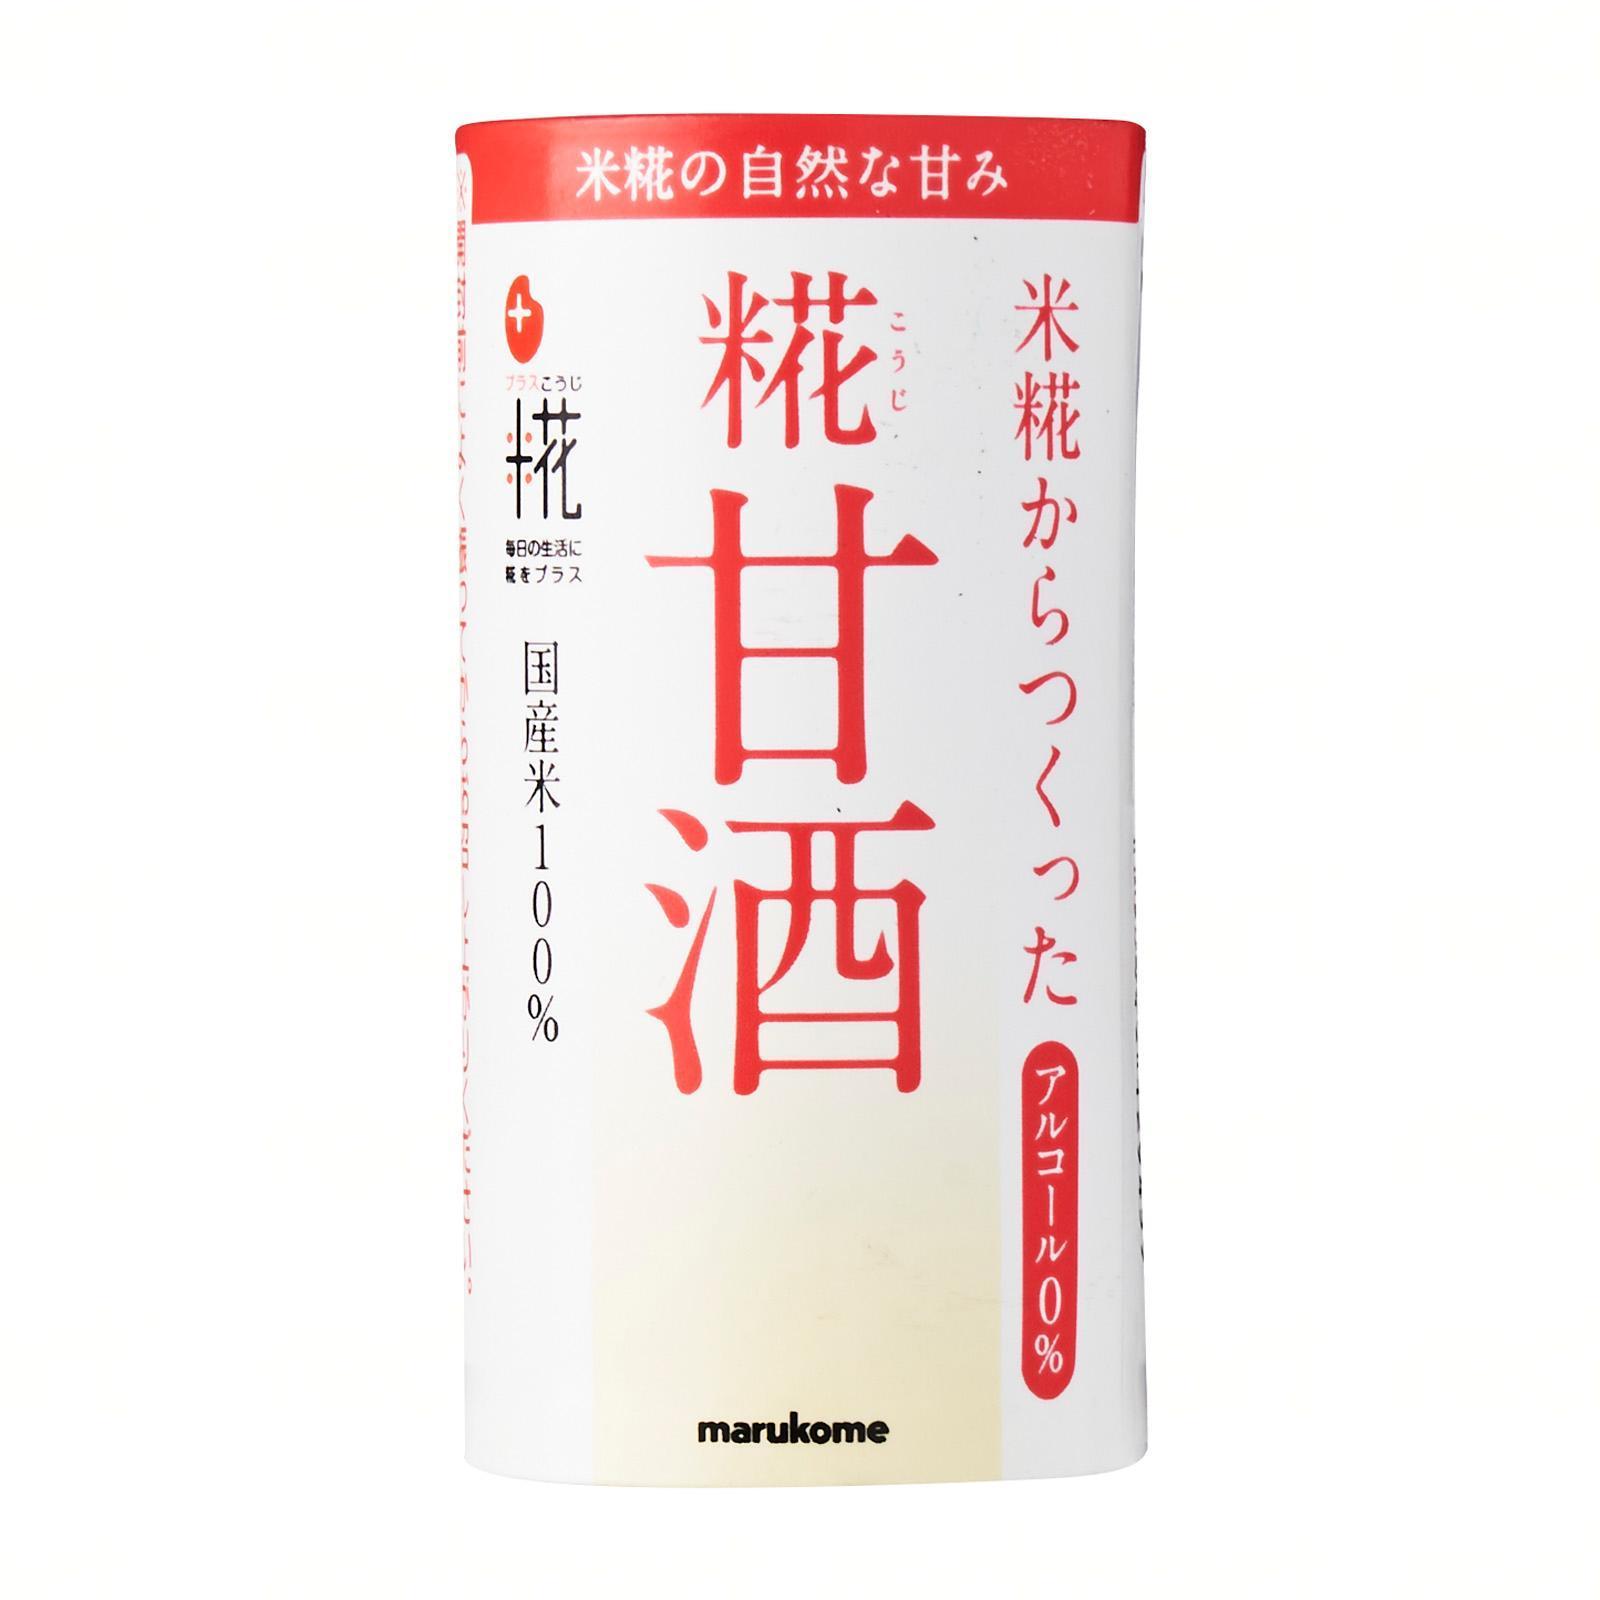 Marukome Original Flavour Amazake Drink - Jetro Special